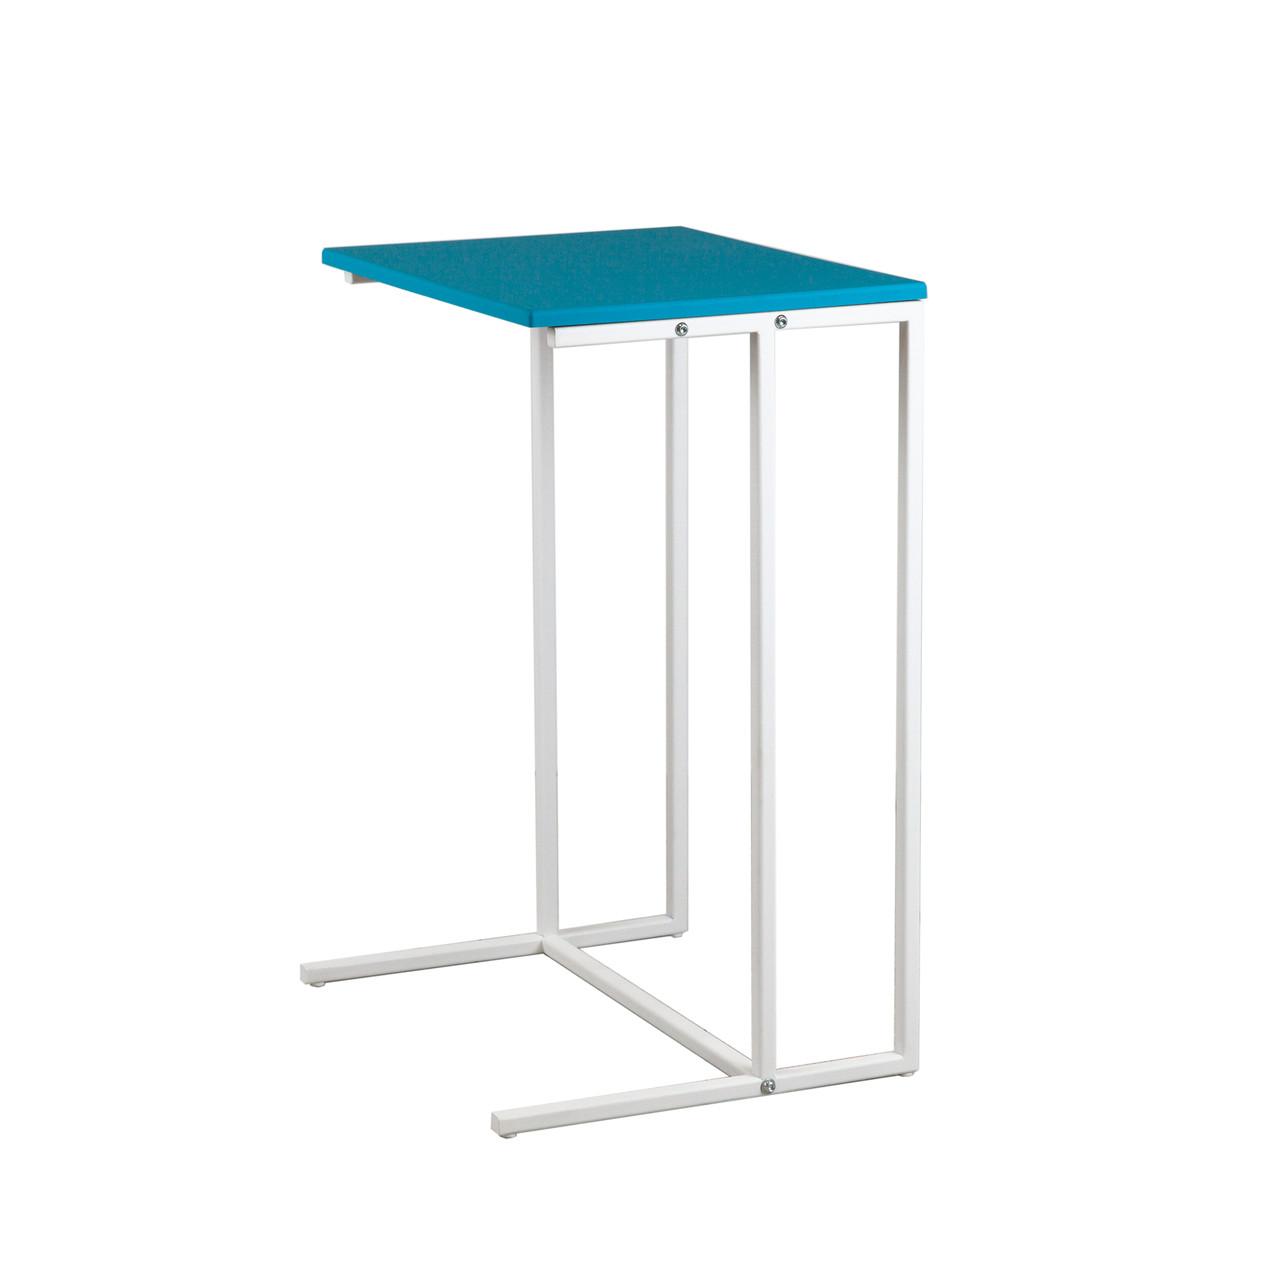 Стол приставной для предметов комфорта и IT-техники Commus Comfort A440 mint/white